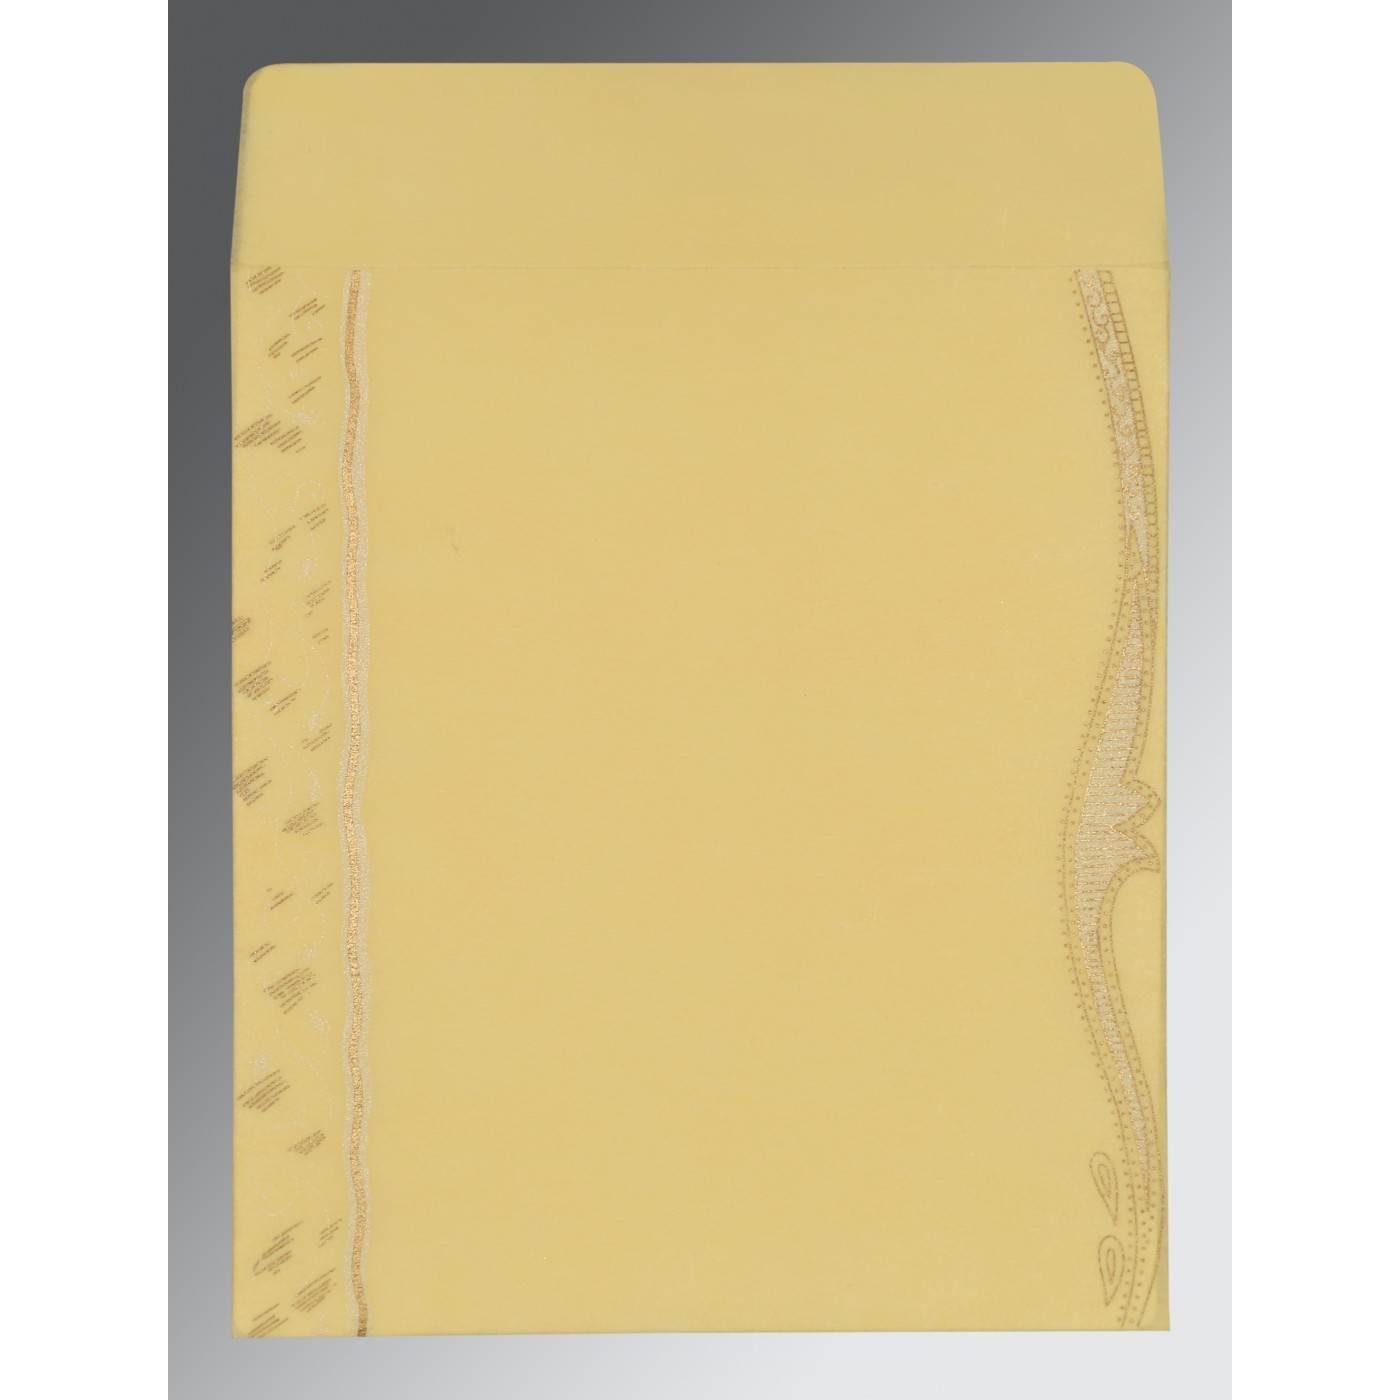 MUSTARD YELLOW SHIMMERY EMBOSSED WEDDING CARD : CIN-8210G - IndianWeddingCards